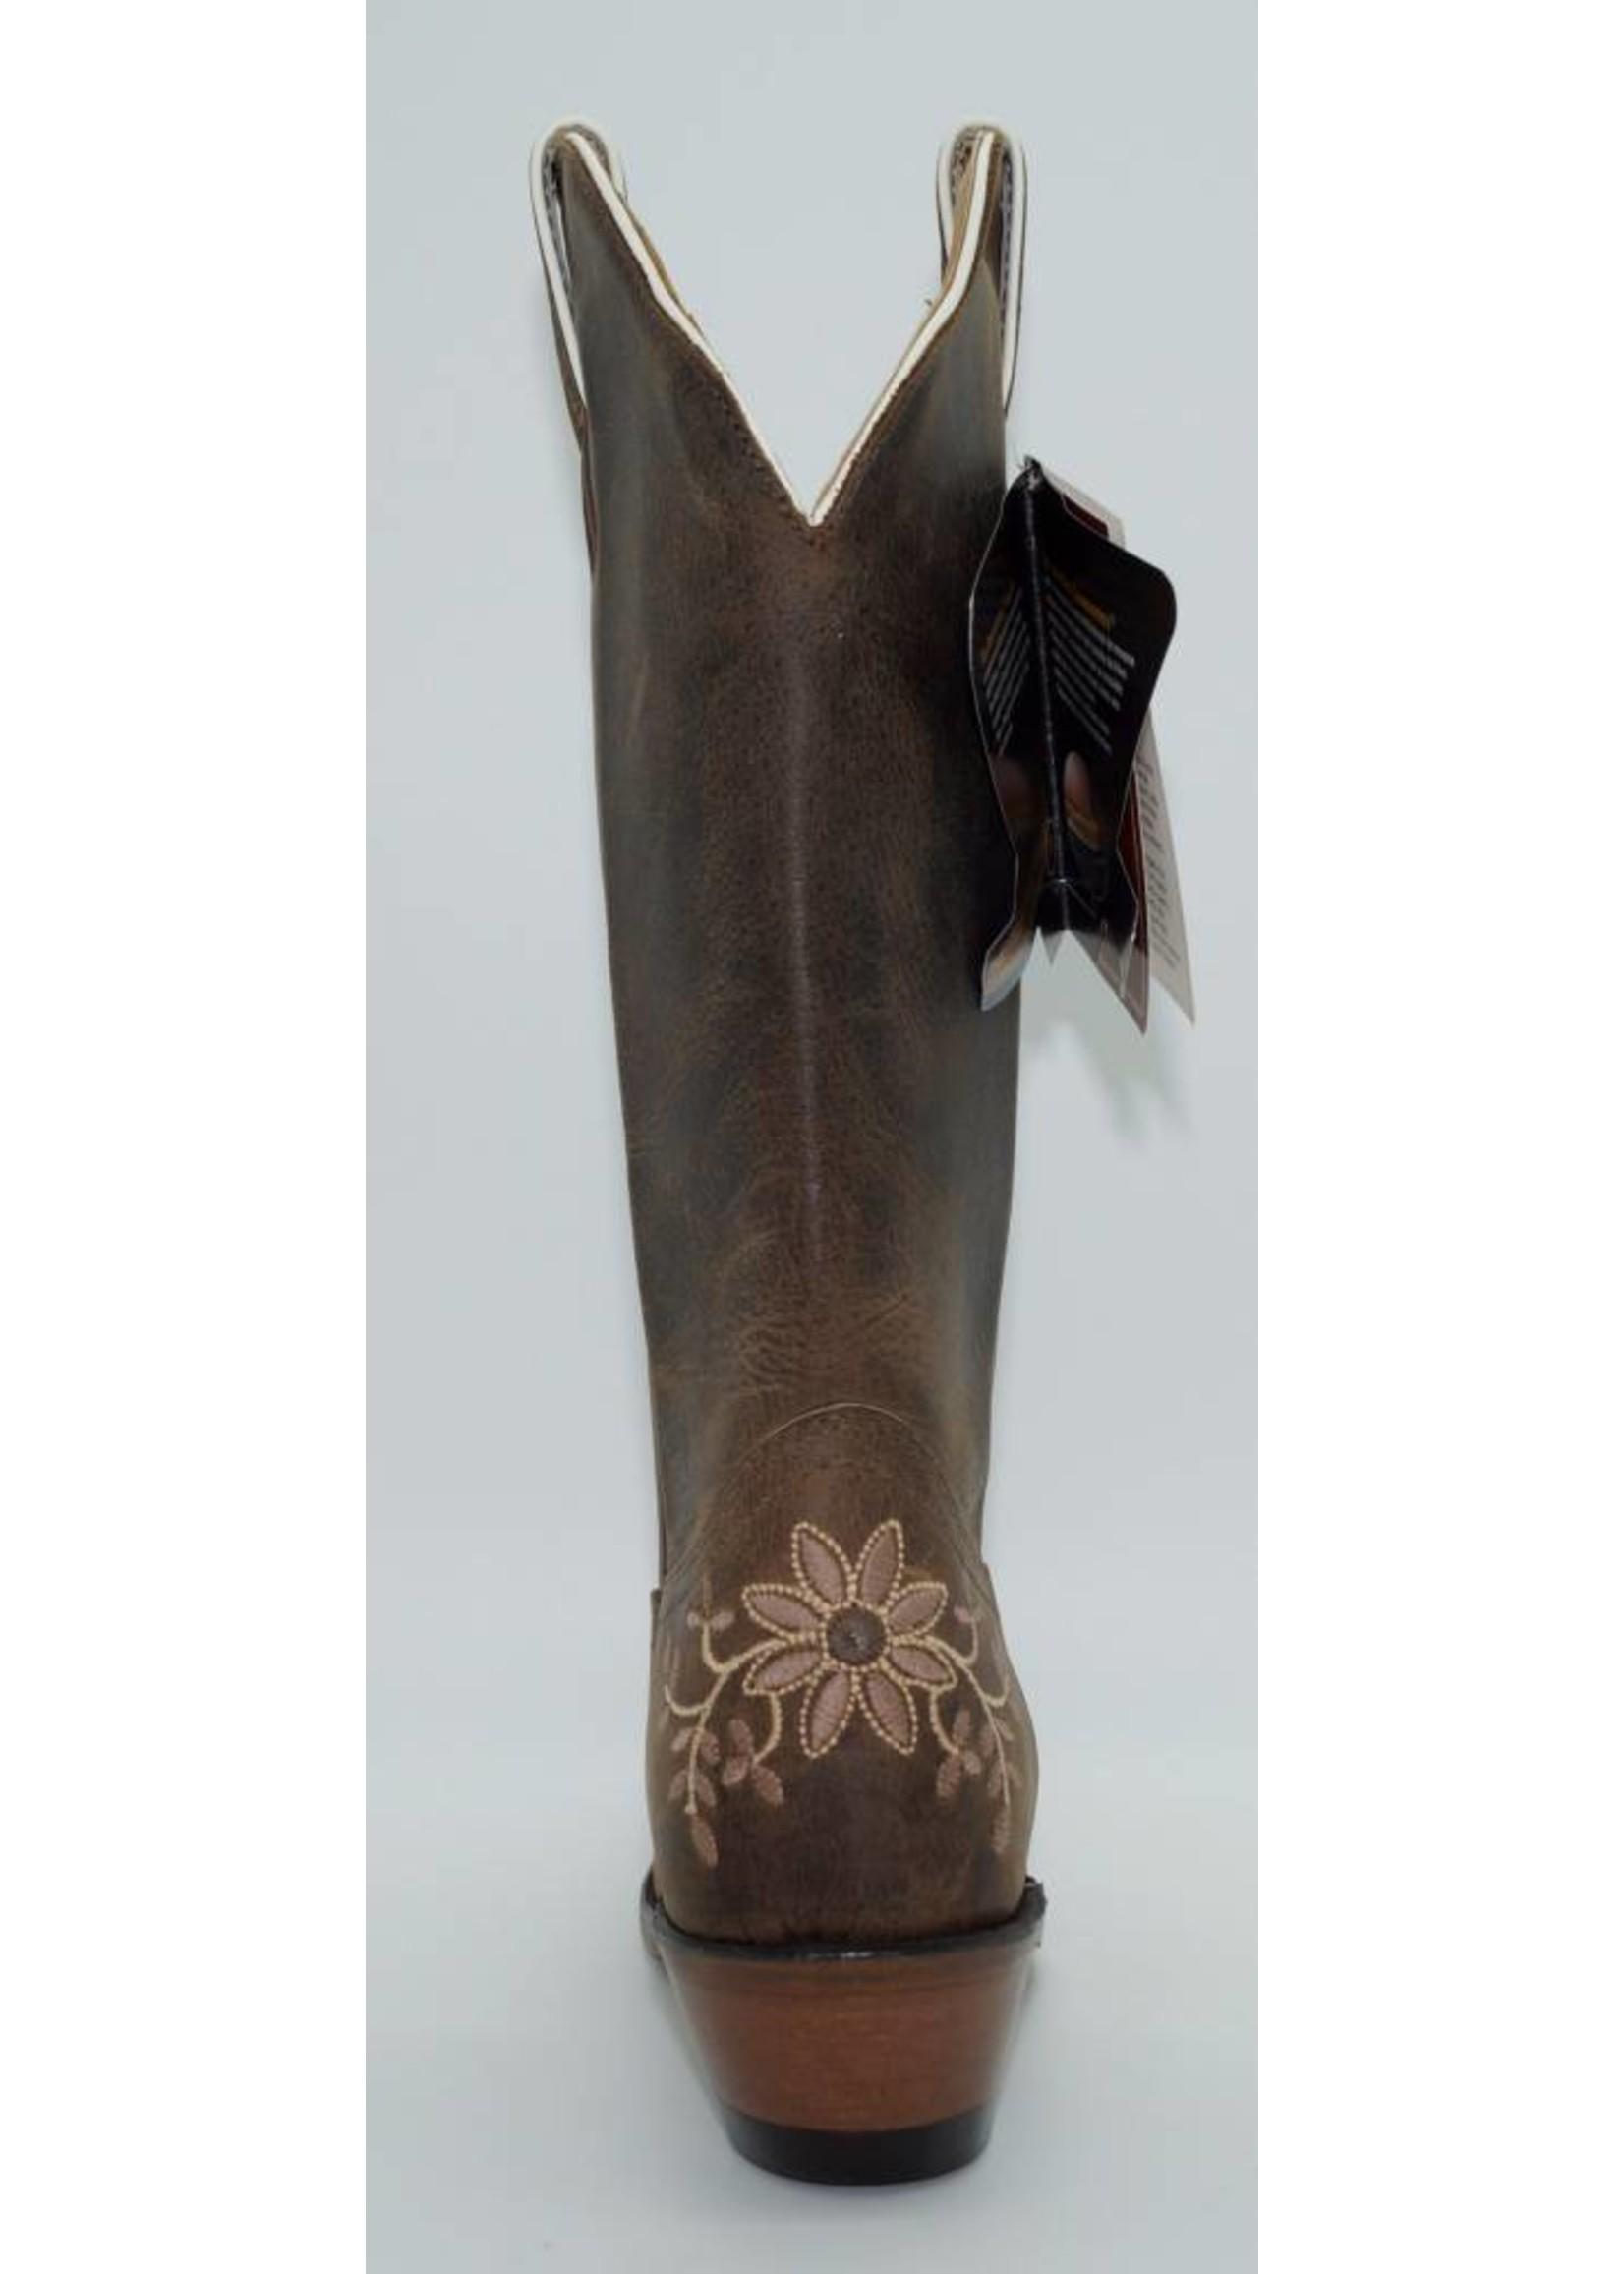 Boulet Women's 13 Inch Western Boot 2602